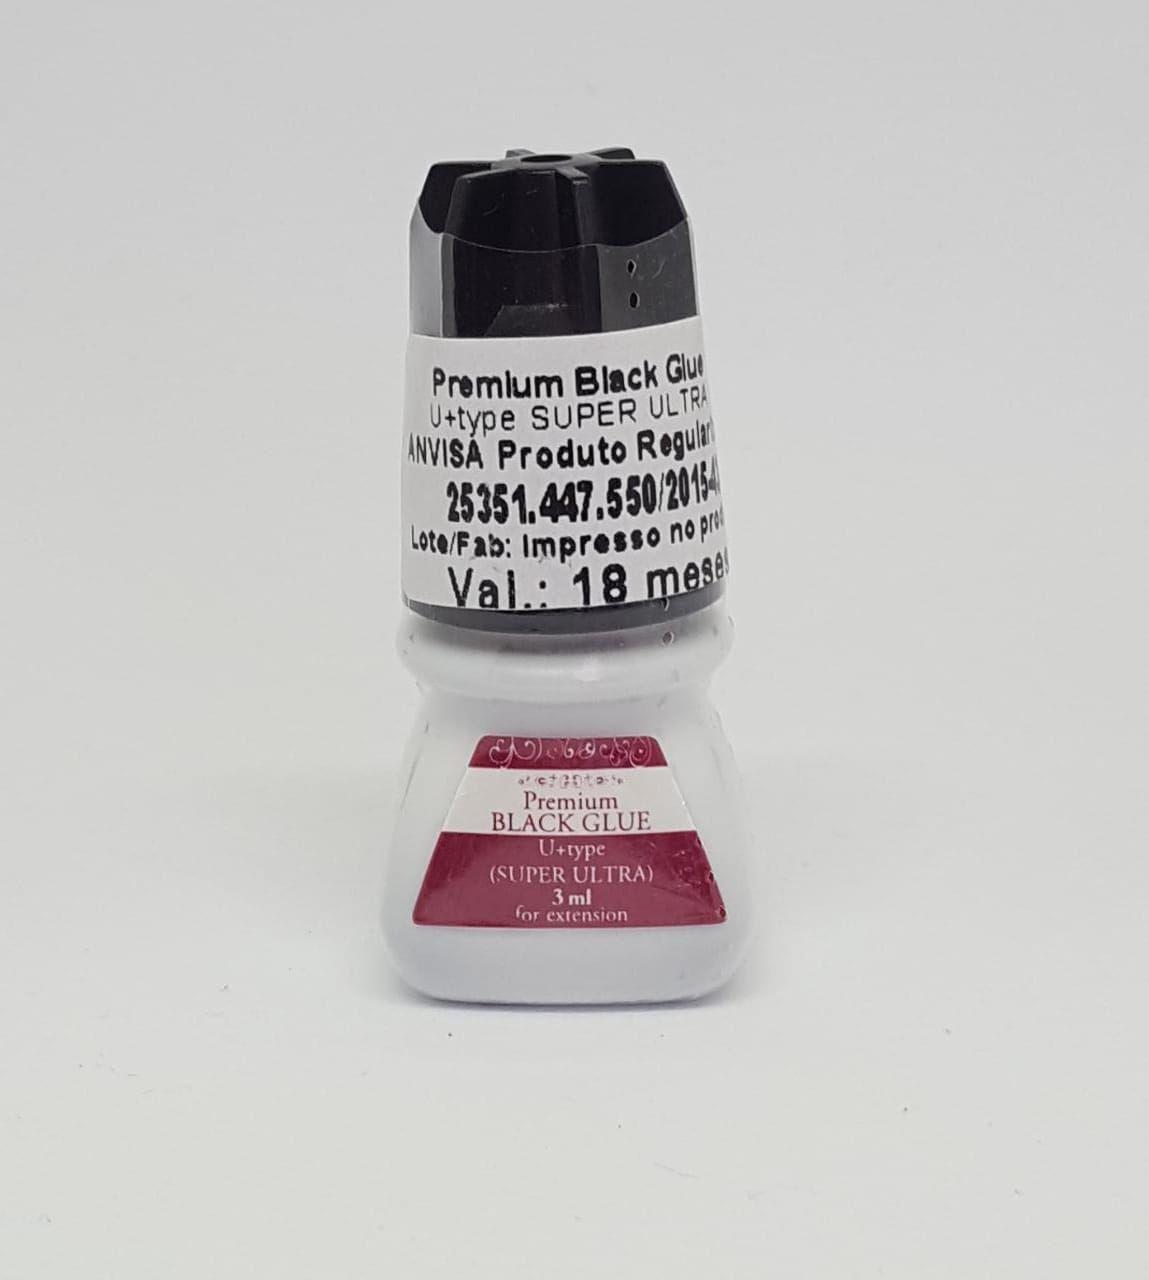 COLA BLACK GLUE PREMIUM - 3 ML  - Misstética